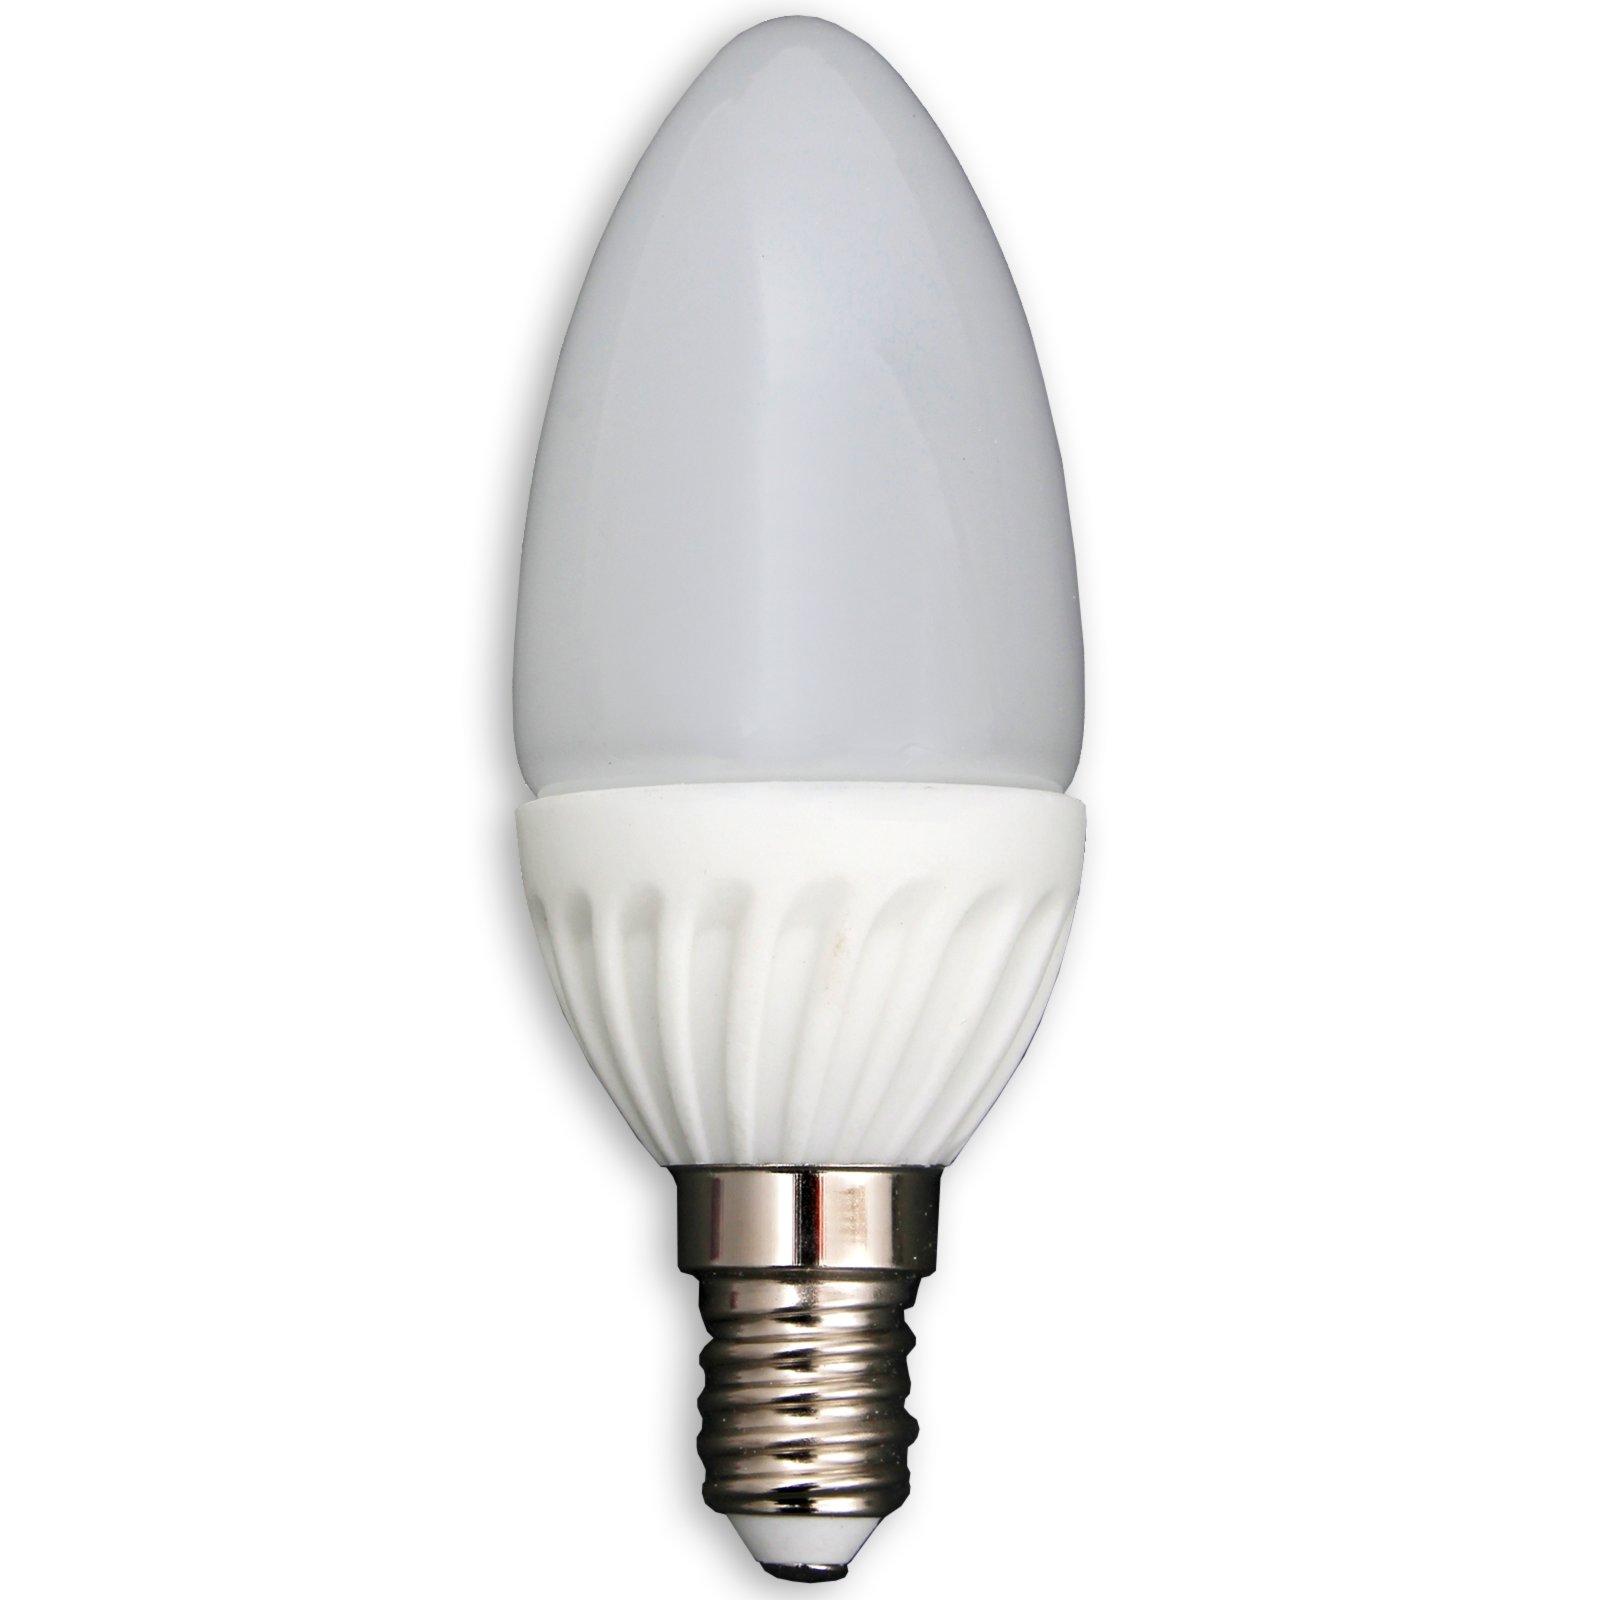 led leuchtmittel e14 5 watt warmwei leuchtmittel. Black Bedroom Furniture Sets. Home Design Ideas